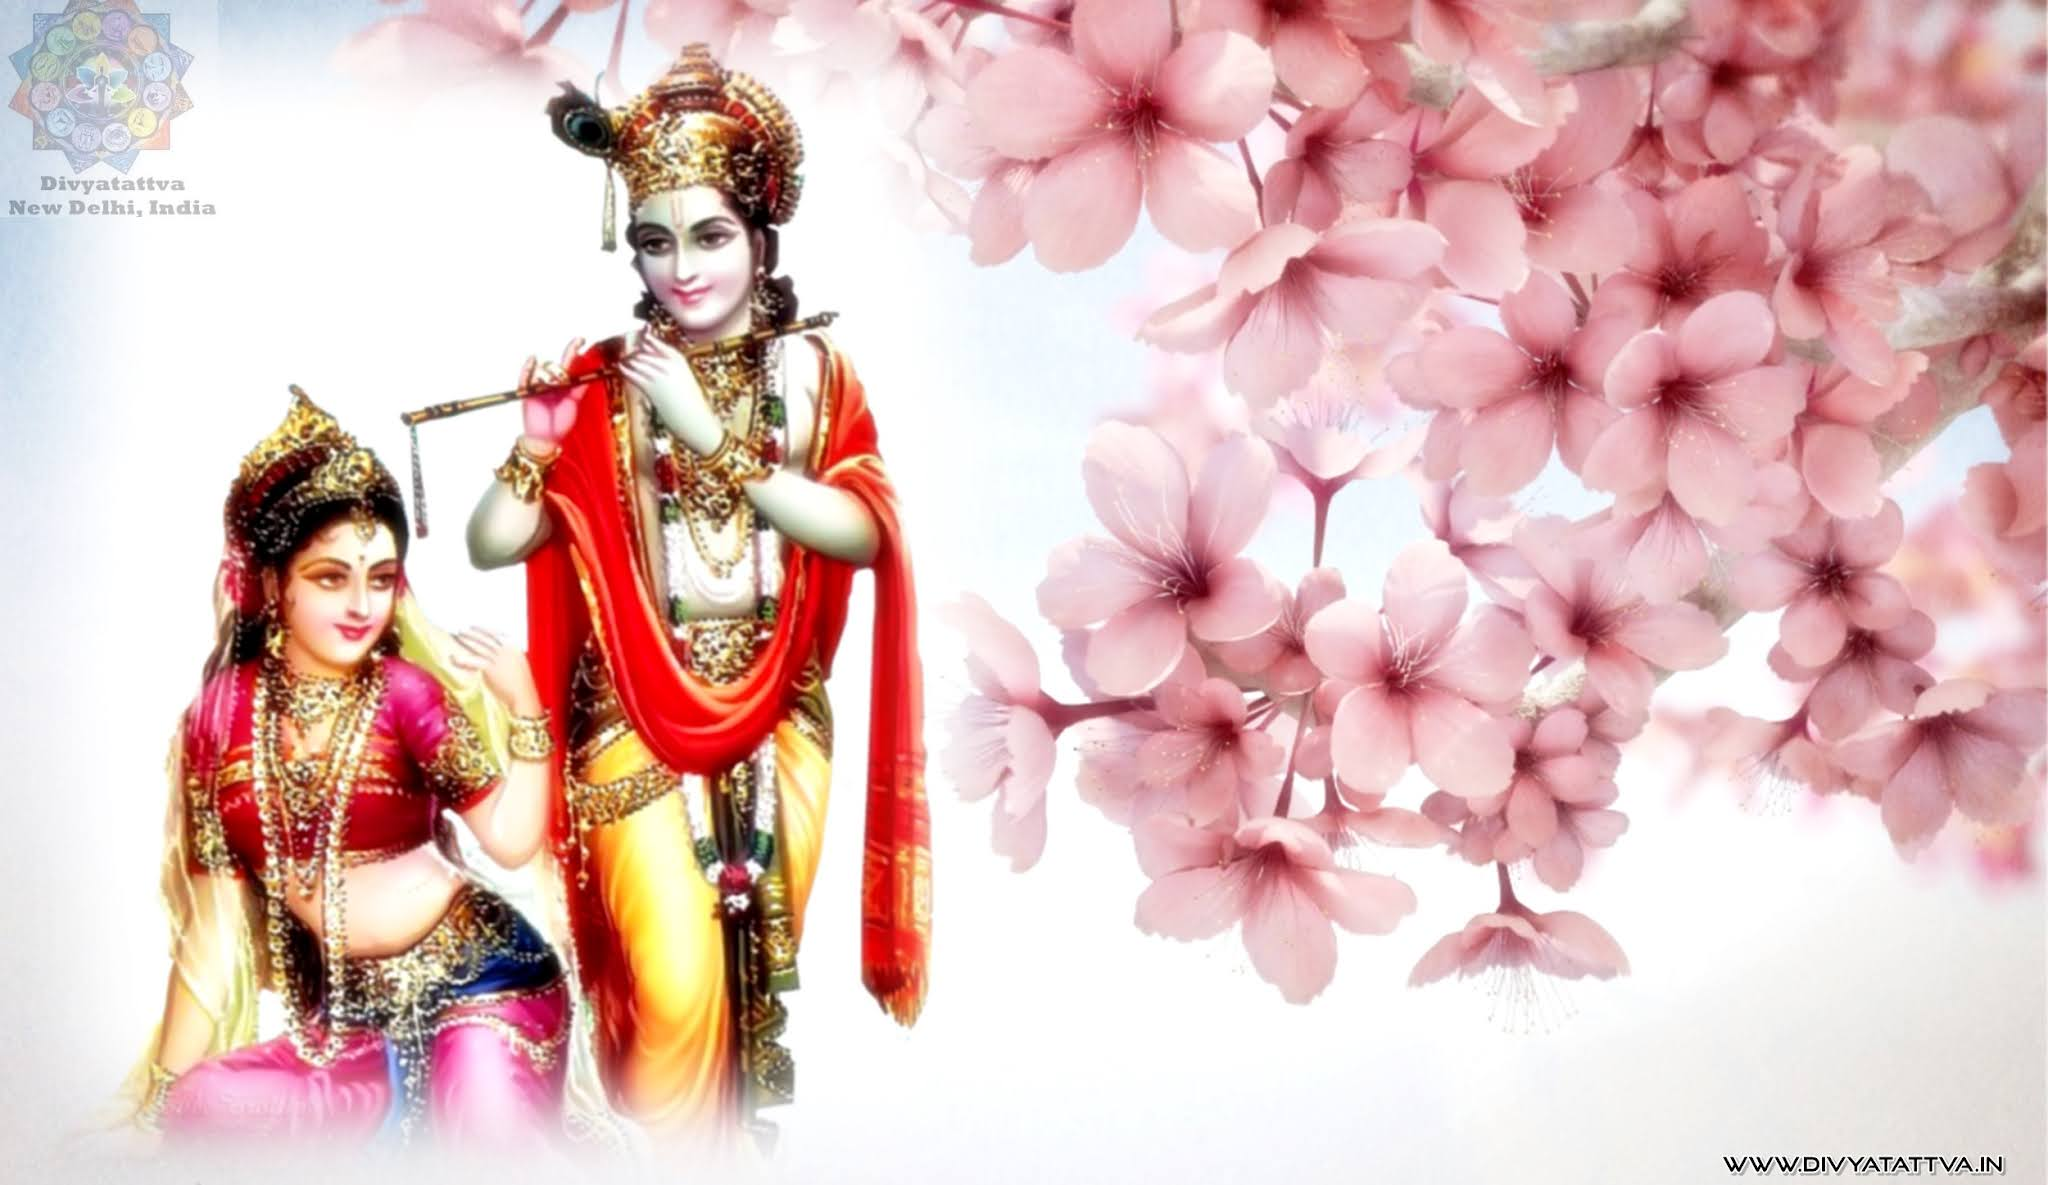 Beautiful Radha Krishna 4K UHD Widescreen Wallpapers, 3D Photos of Srimati Radhe Govinda for Free Download